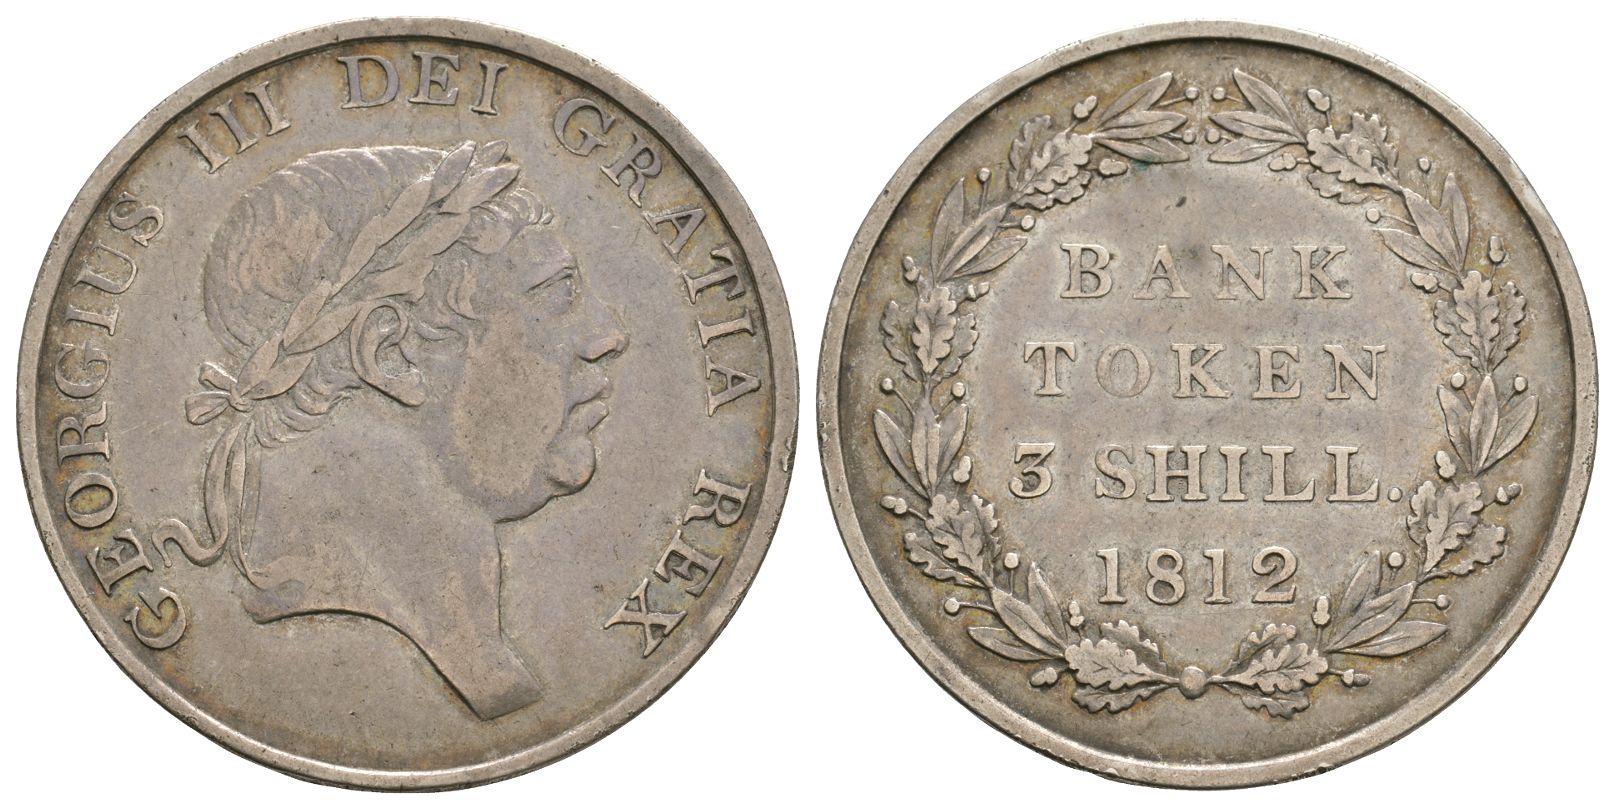 British Tokens - George III - 1812 - 3 Shilling Bank Token